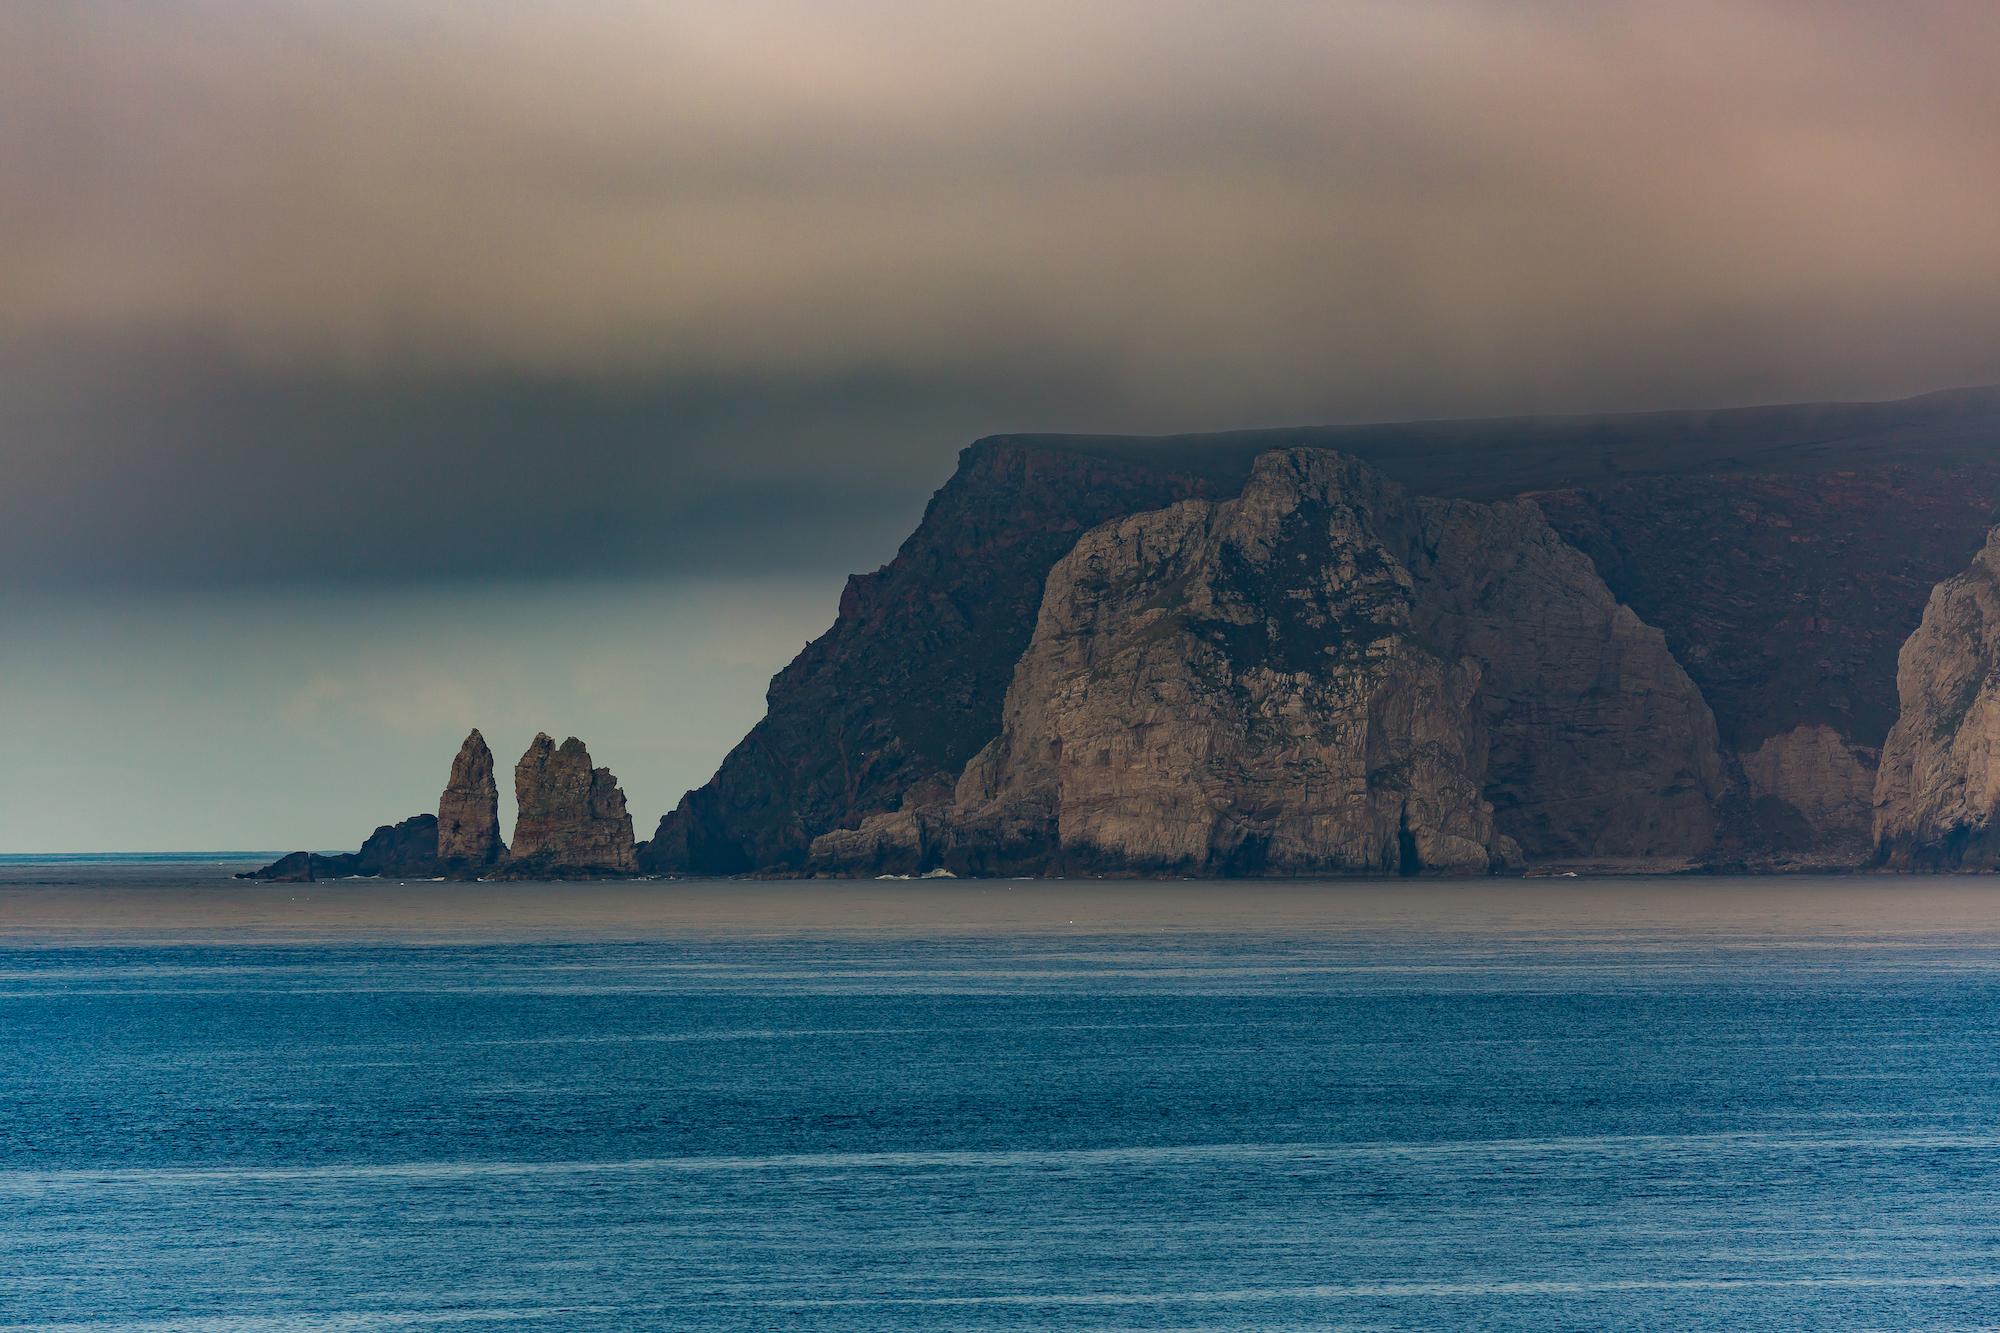 (840) Whiten Head (An Ceann Geal), Loch Eriboll, Durness, Cape Wrath, Sutherland, Scotland. Copyright David Wheater.jpg